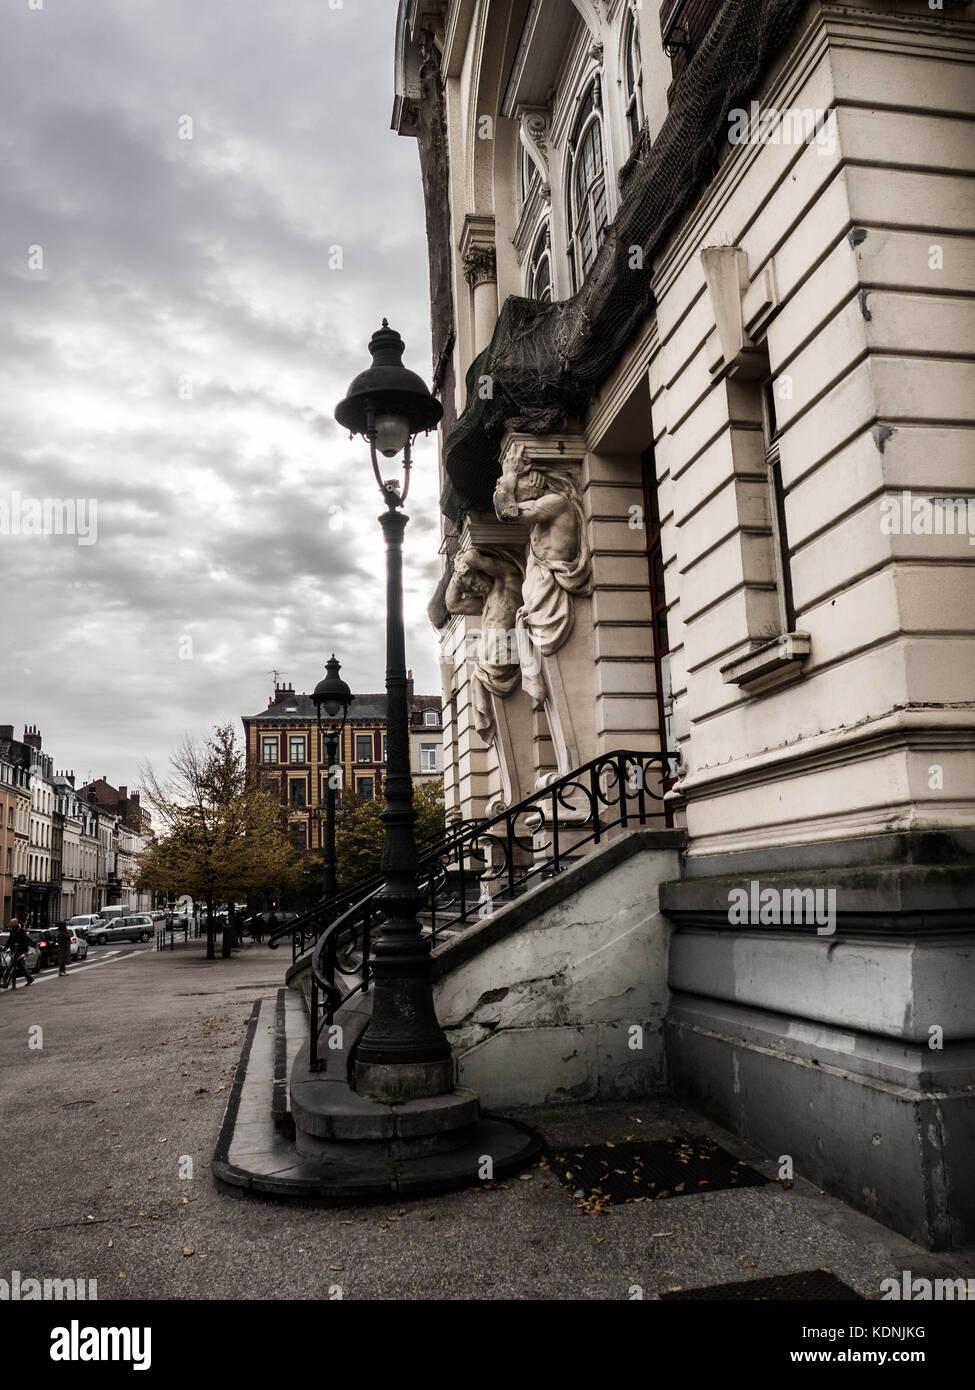 Theatre Sebastpol, Lille - Stock Image